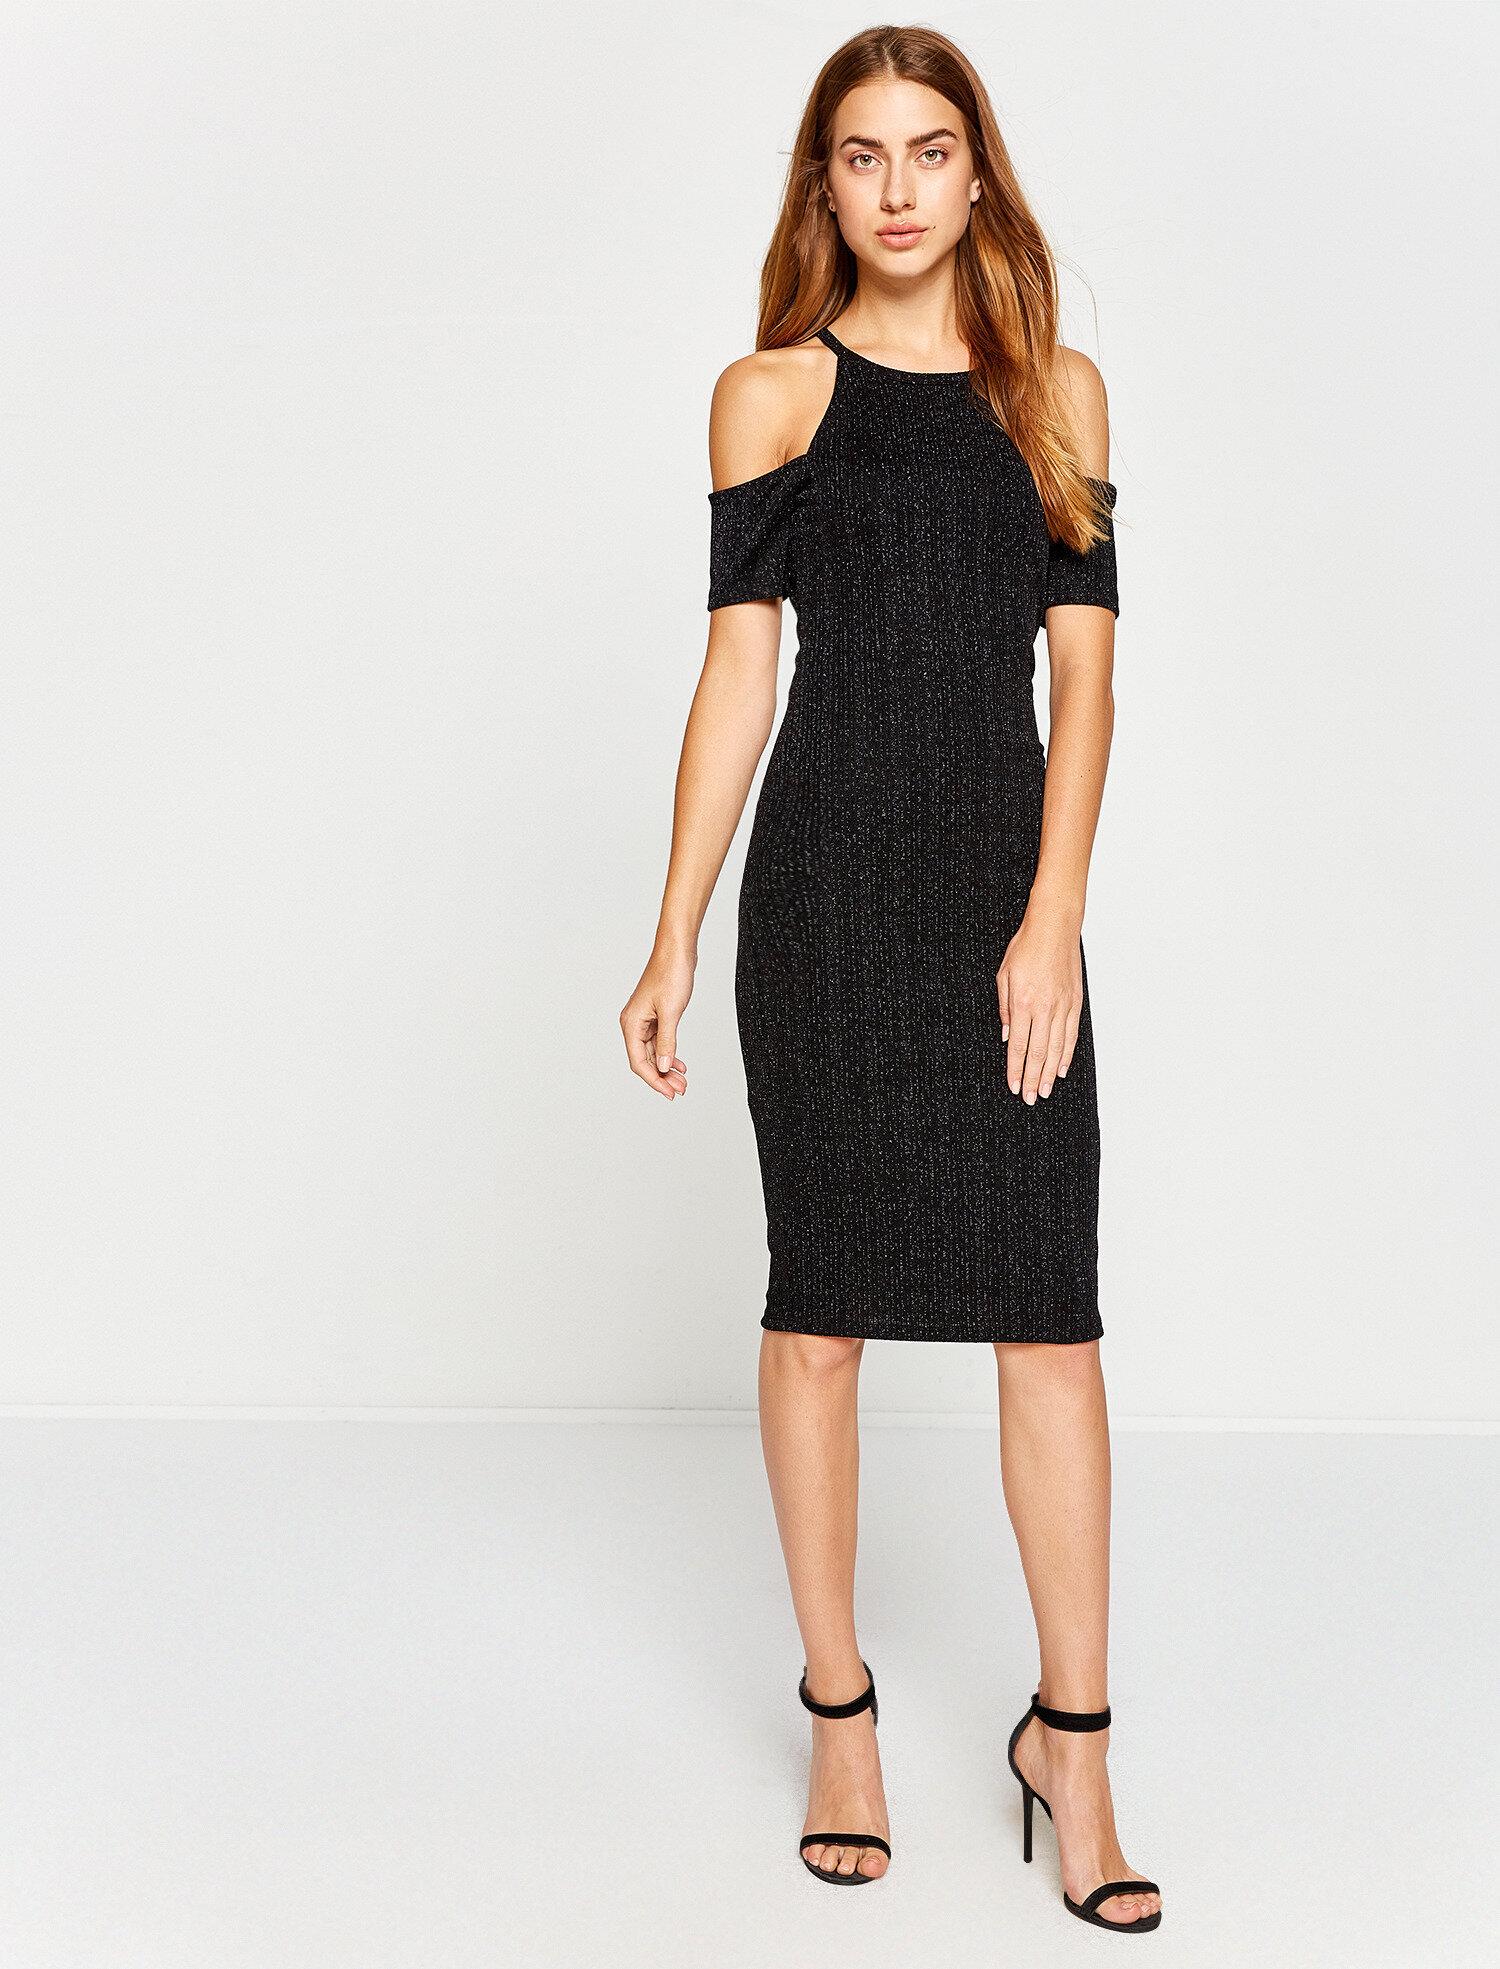 39d3ccfb1e2f8 Siyah Bayan Omuz Detaylı Elbise 7YAK84964FK999 | Koton